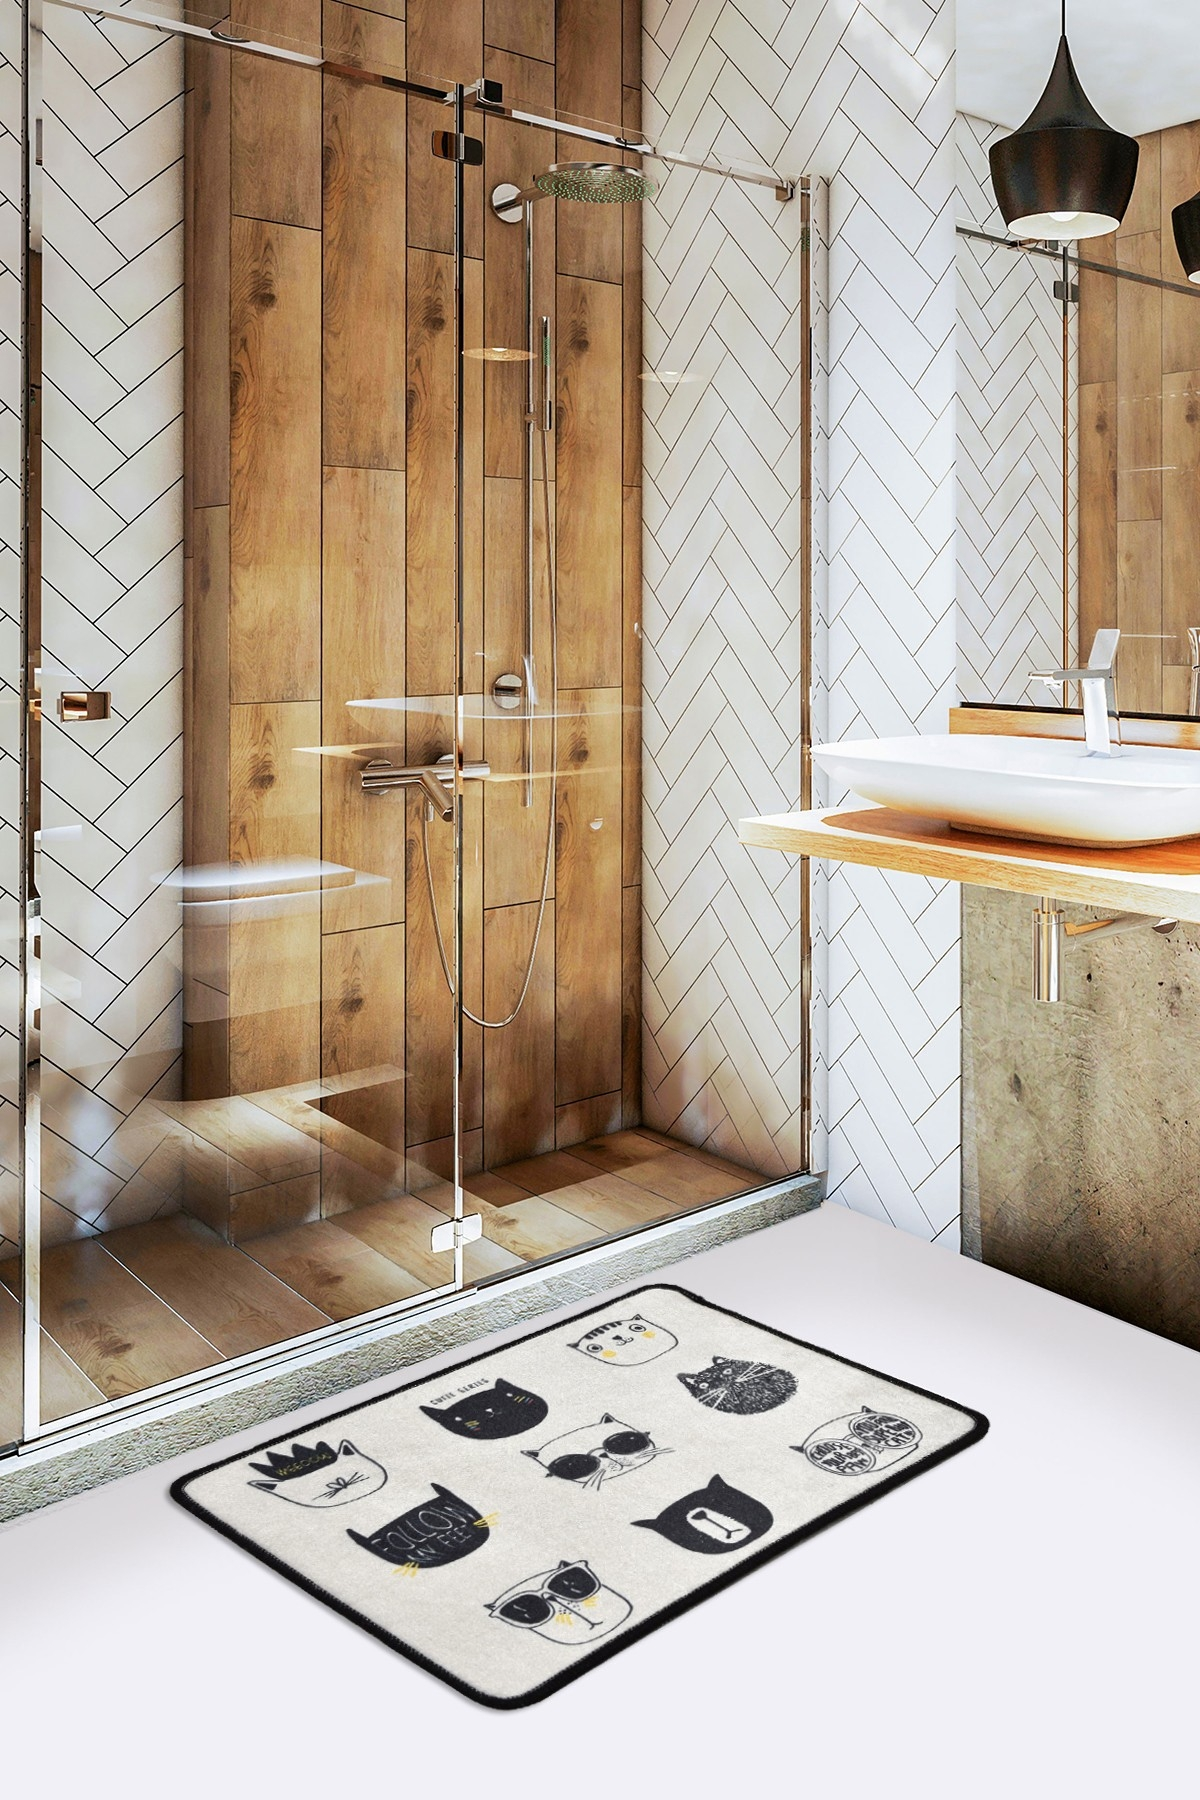 Covoras pentru baie Cutie Alb / Negru, 40 x 60 cm imagine